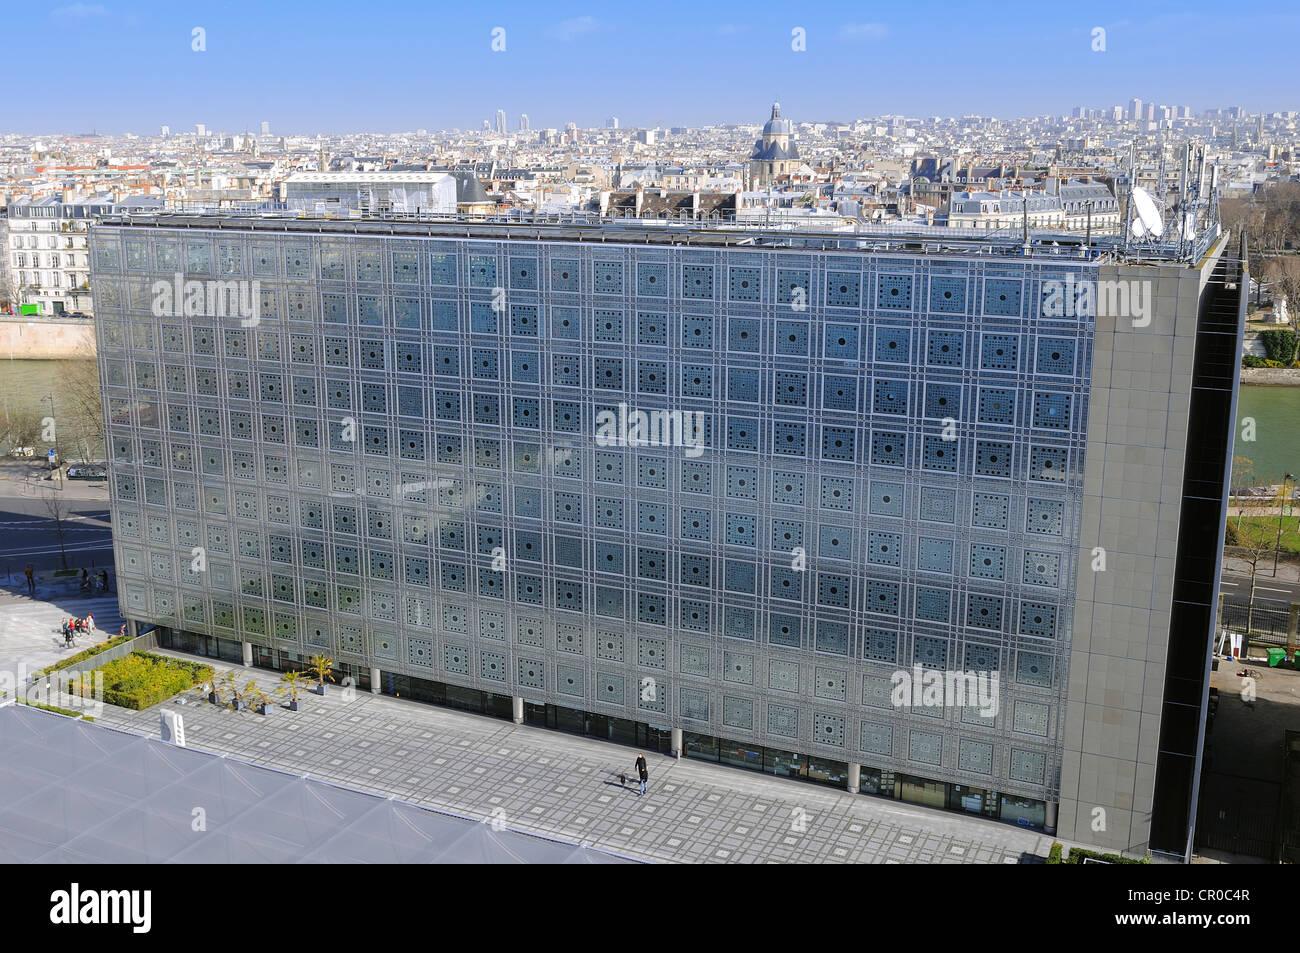 France, Paris, Institut du Monde Arabe (Arab World Institute) by architect Jean Nouvel and architecture-studio - Stock Image